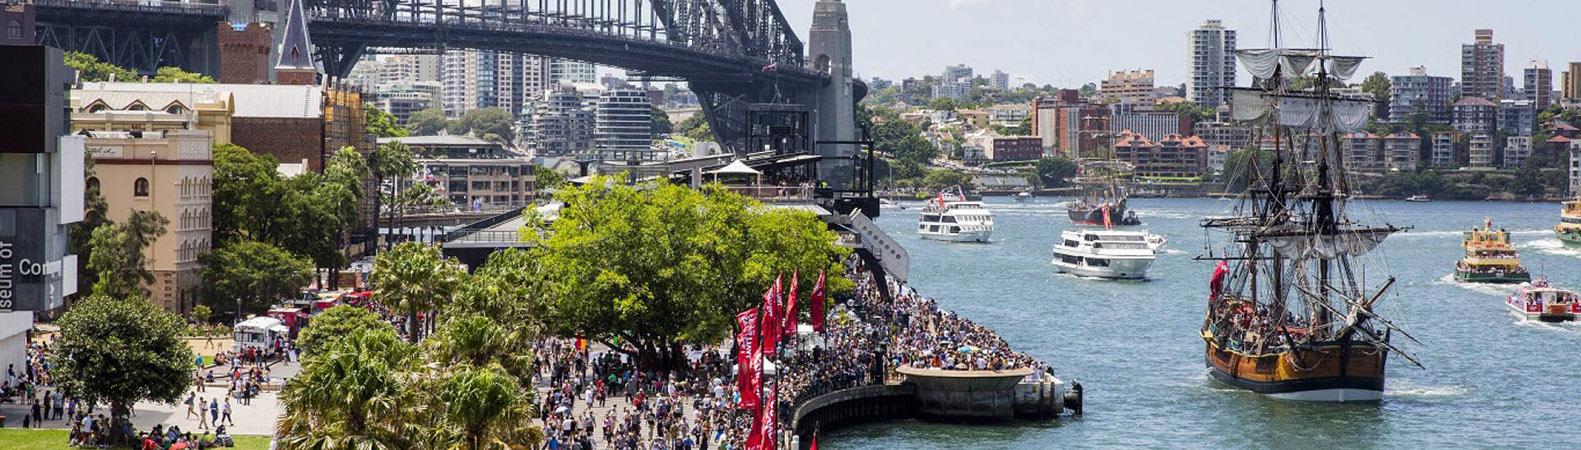 Tour du lịch Úc khám phá SYDNEY - MELBOURNE 7 ngày